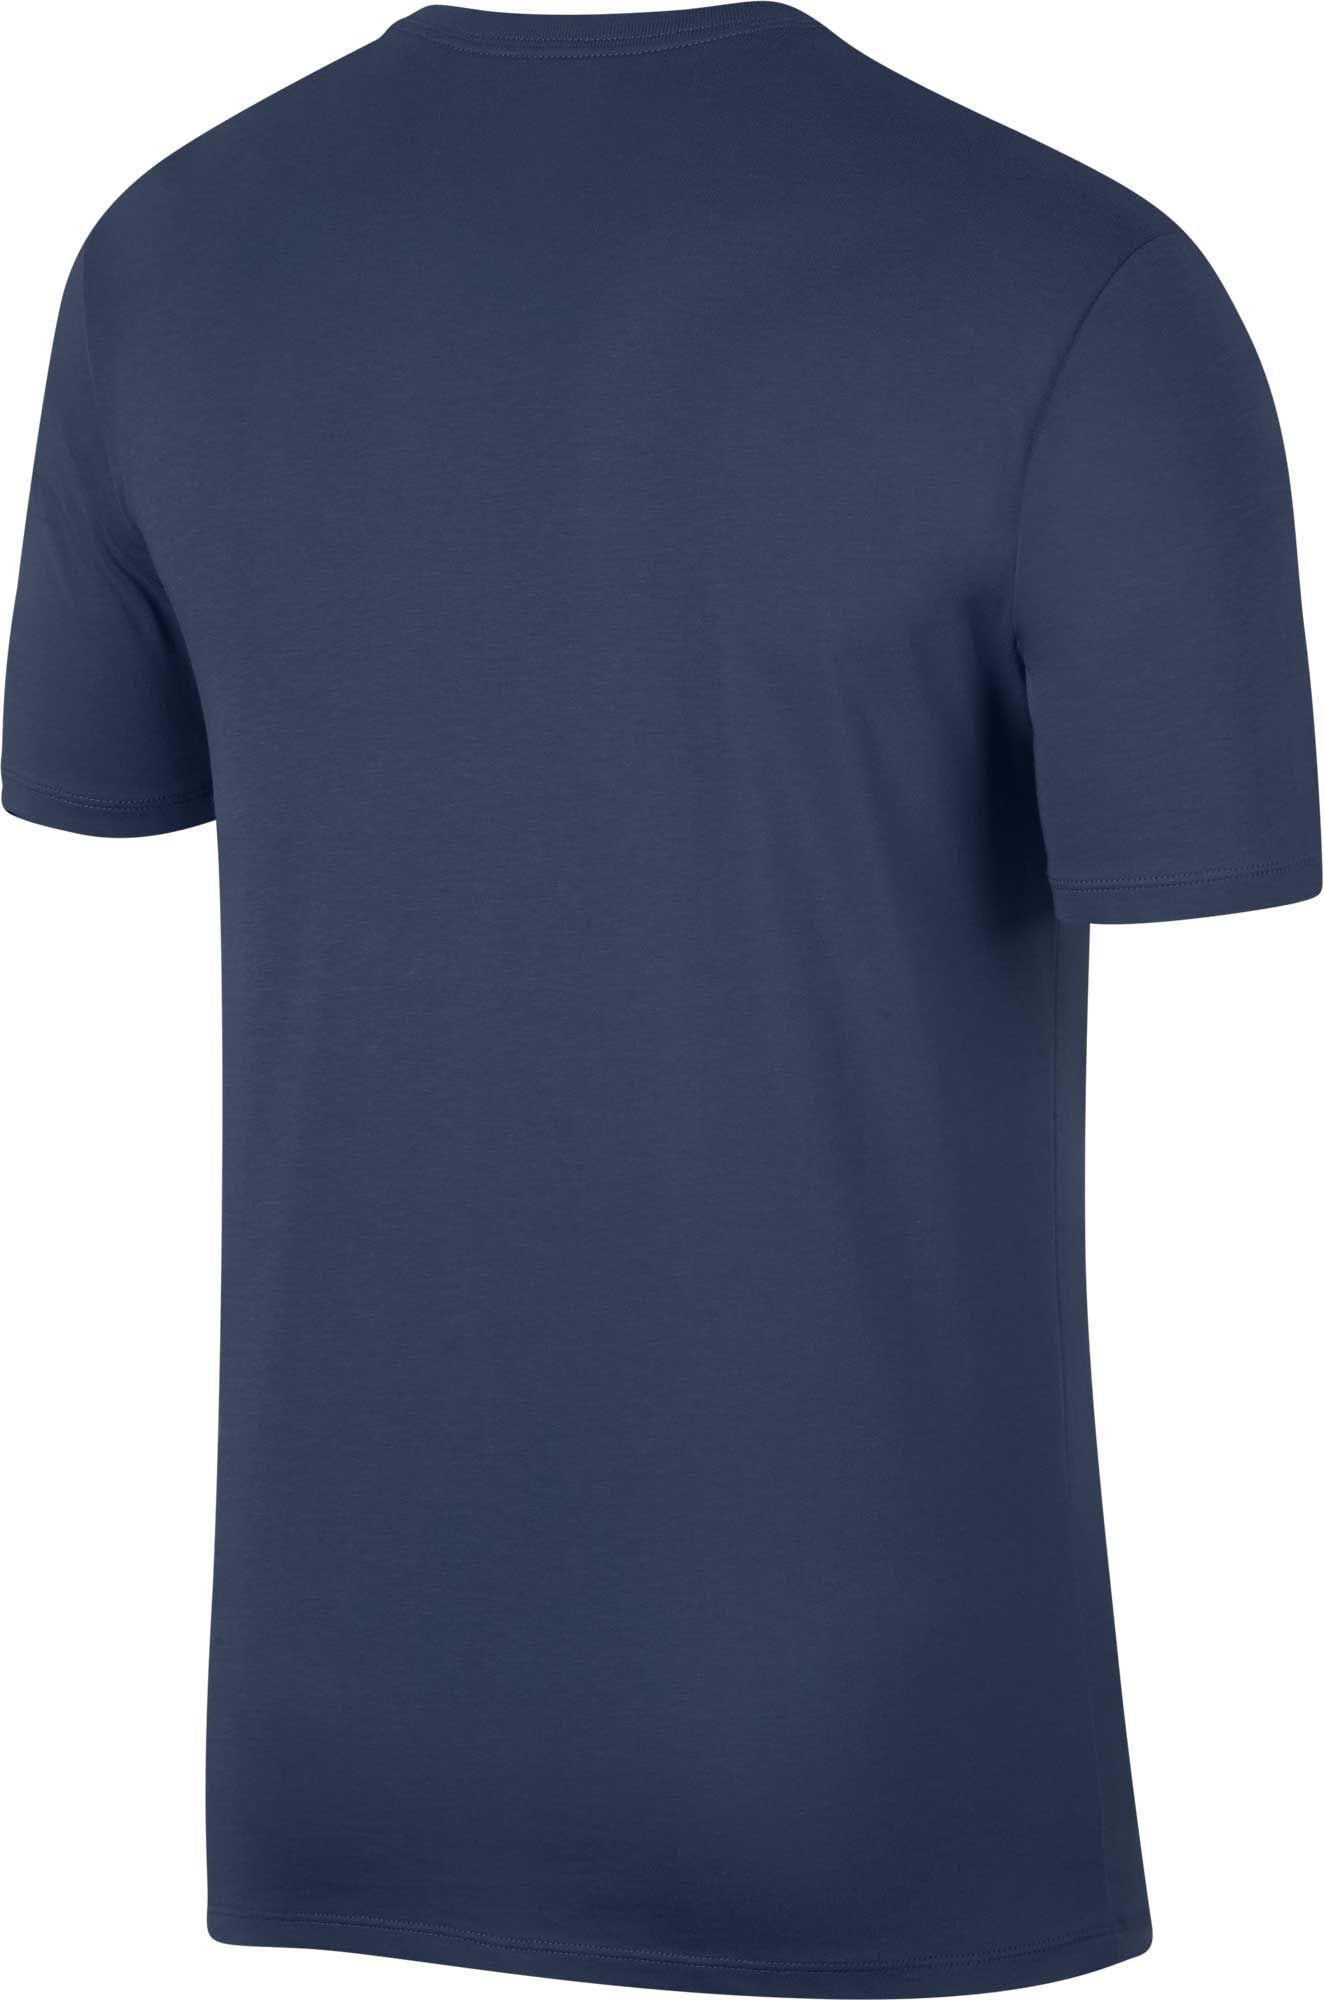 050689a570ebe6 Lyst - Nike Jordan Flight Mashup Graphic Tee in Blue for Men